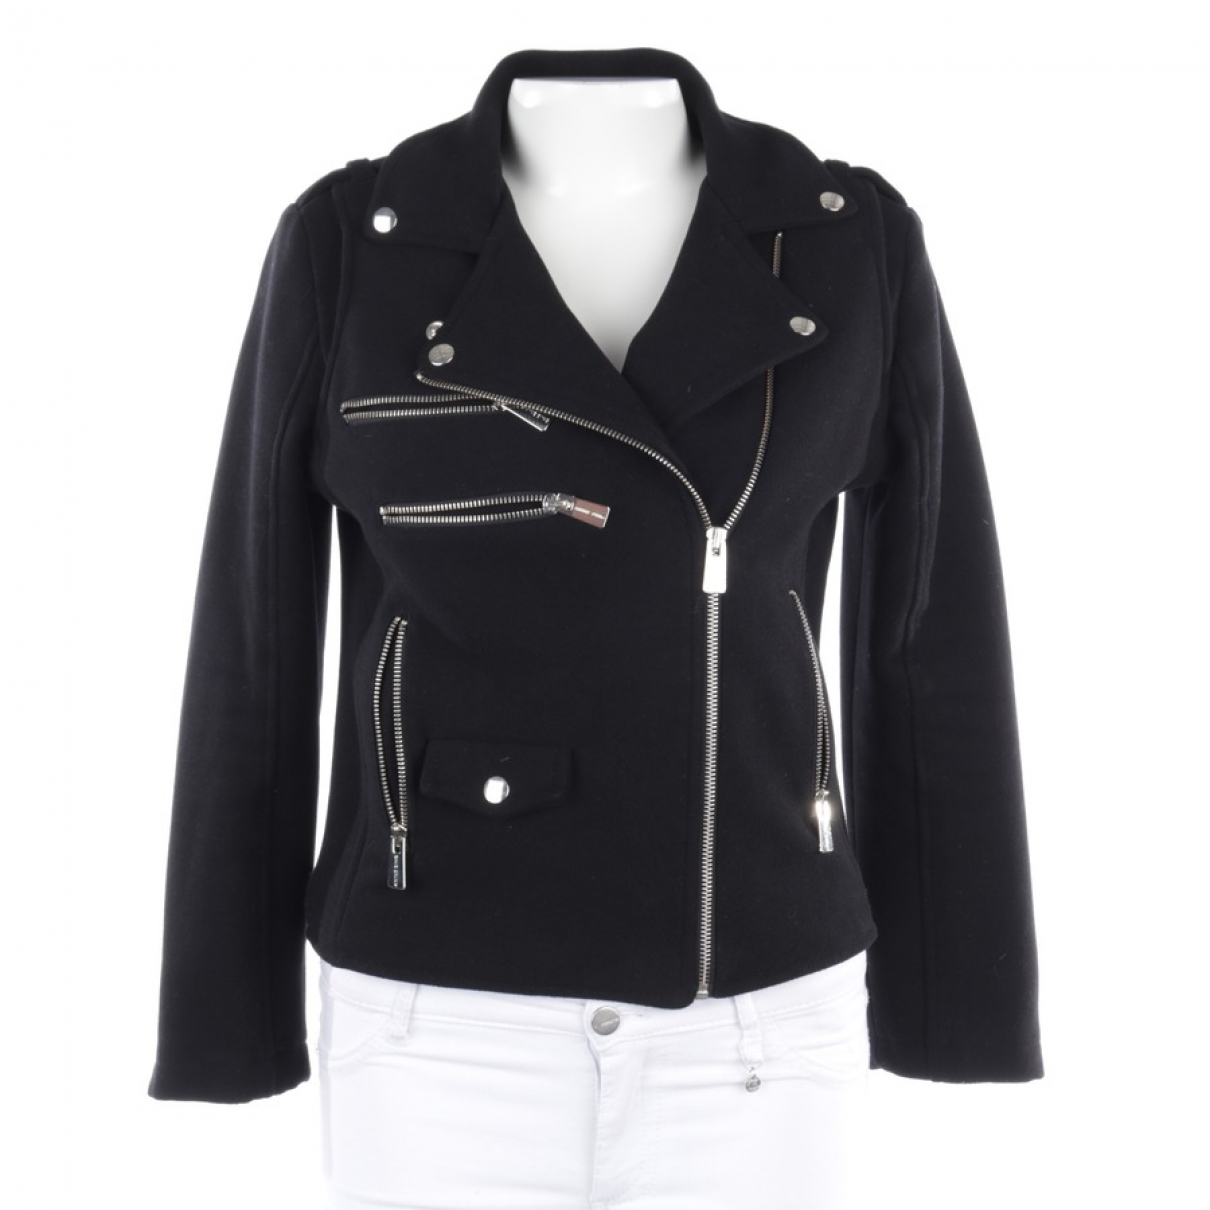 Anine Bing \N Black jacket for Women M International